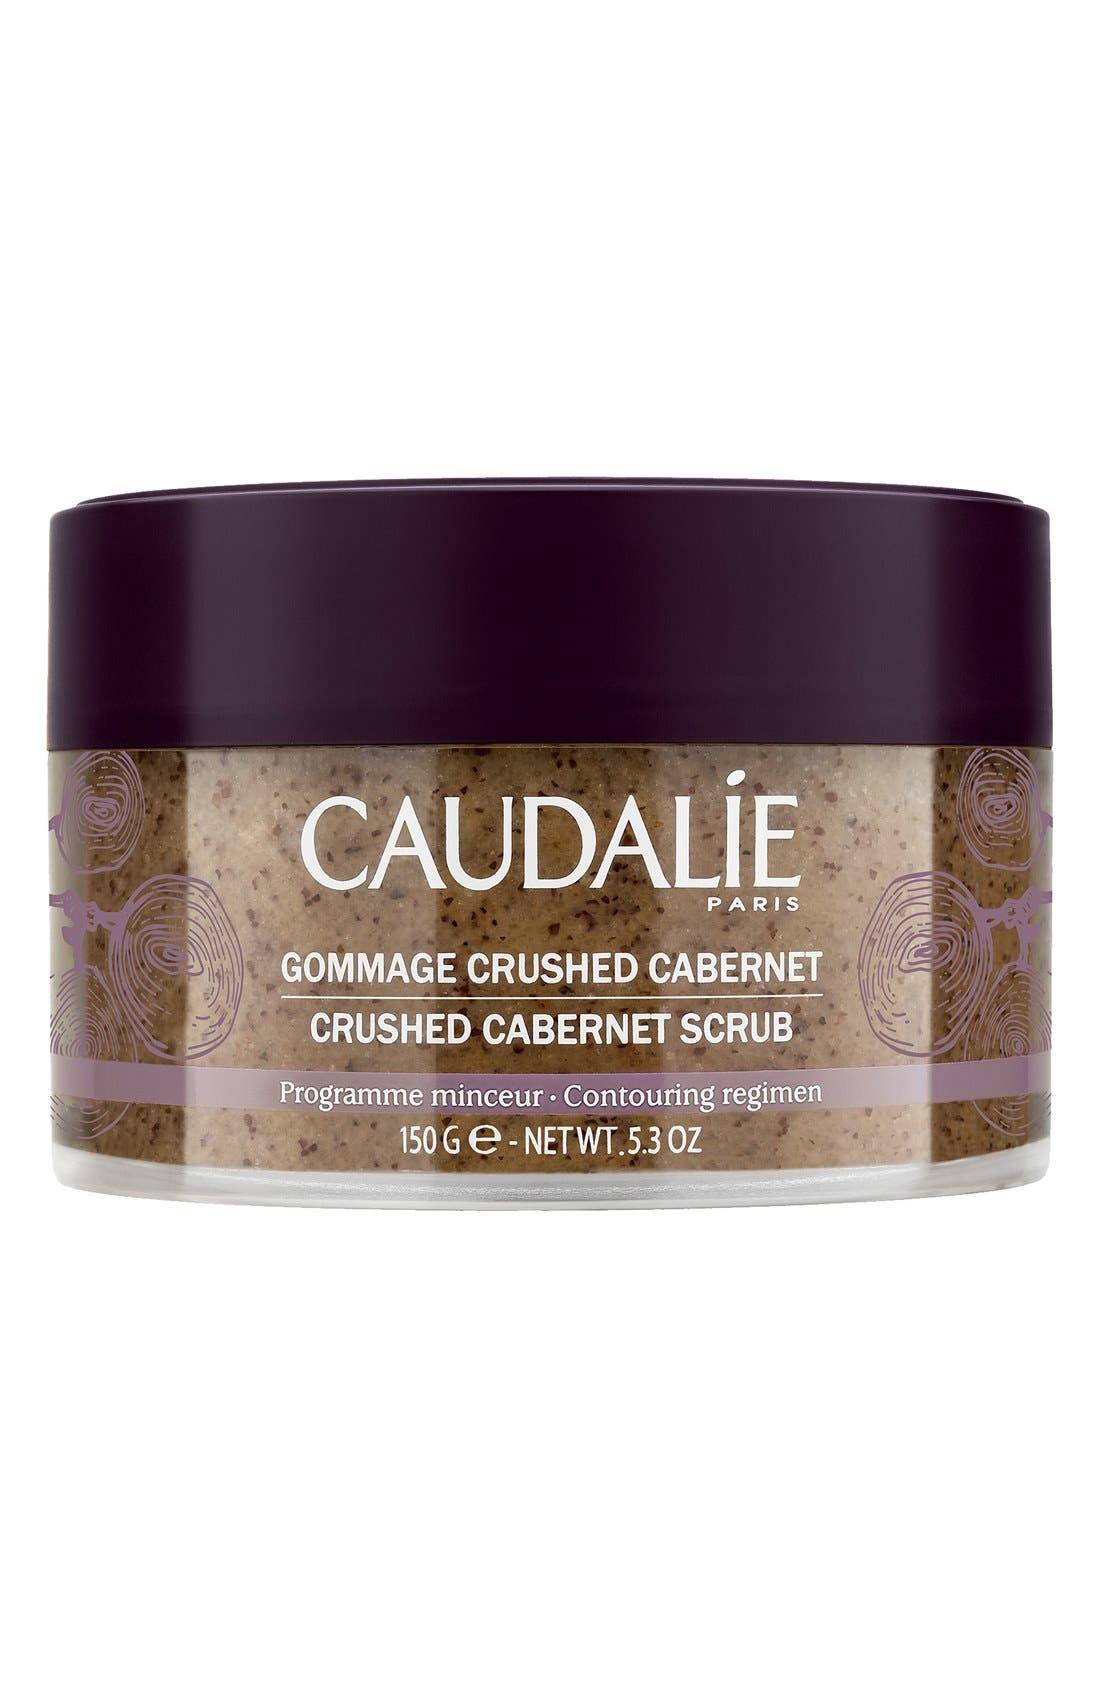 Crushed Cabernet Scrub,                         Main,                         color,